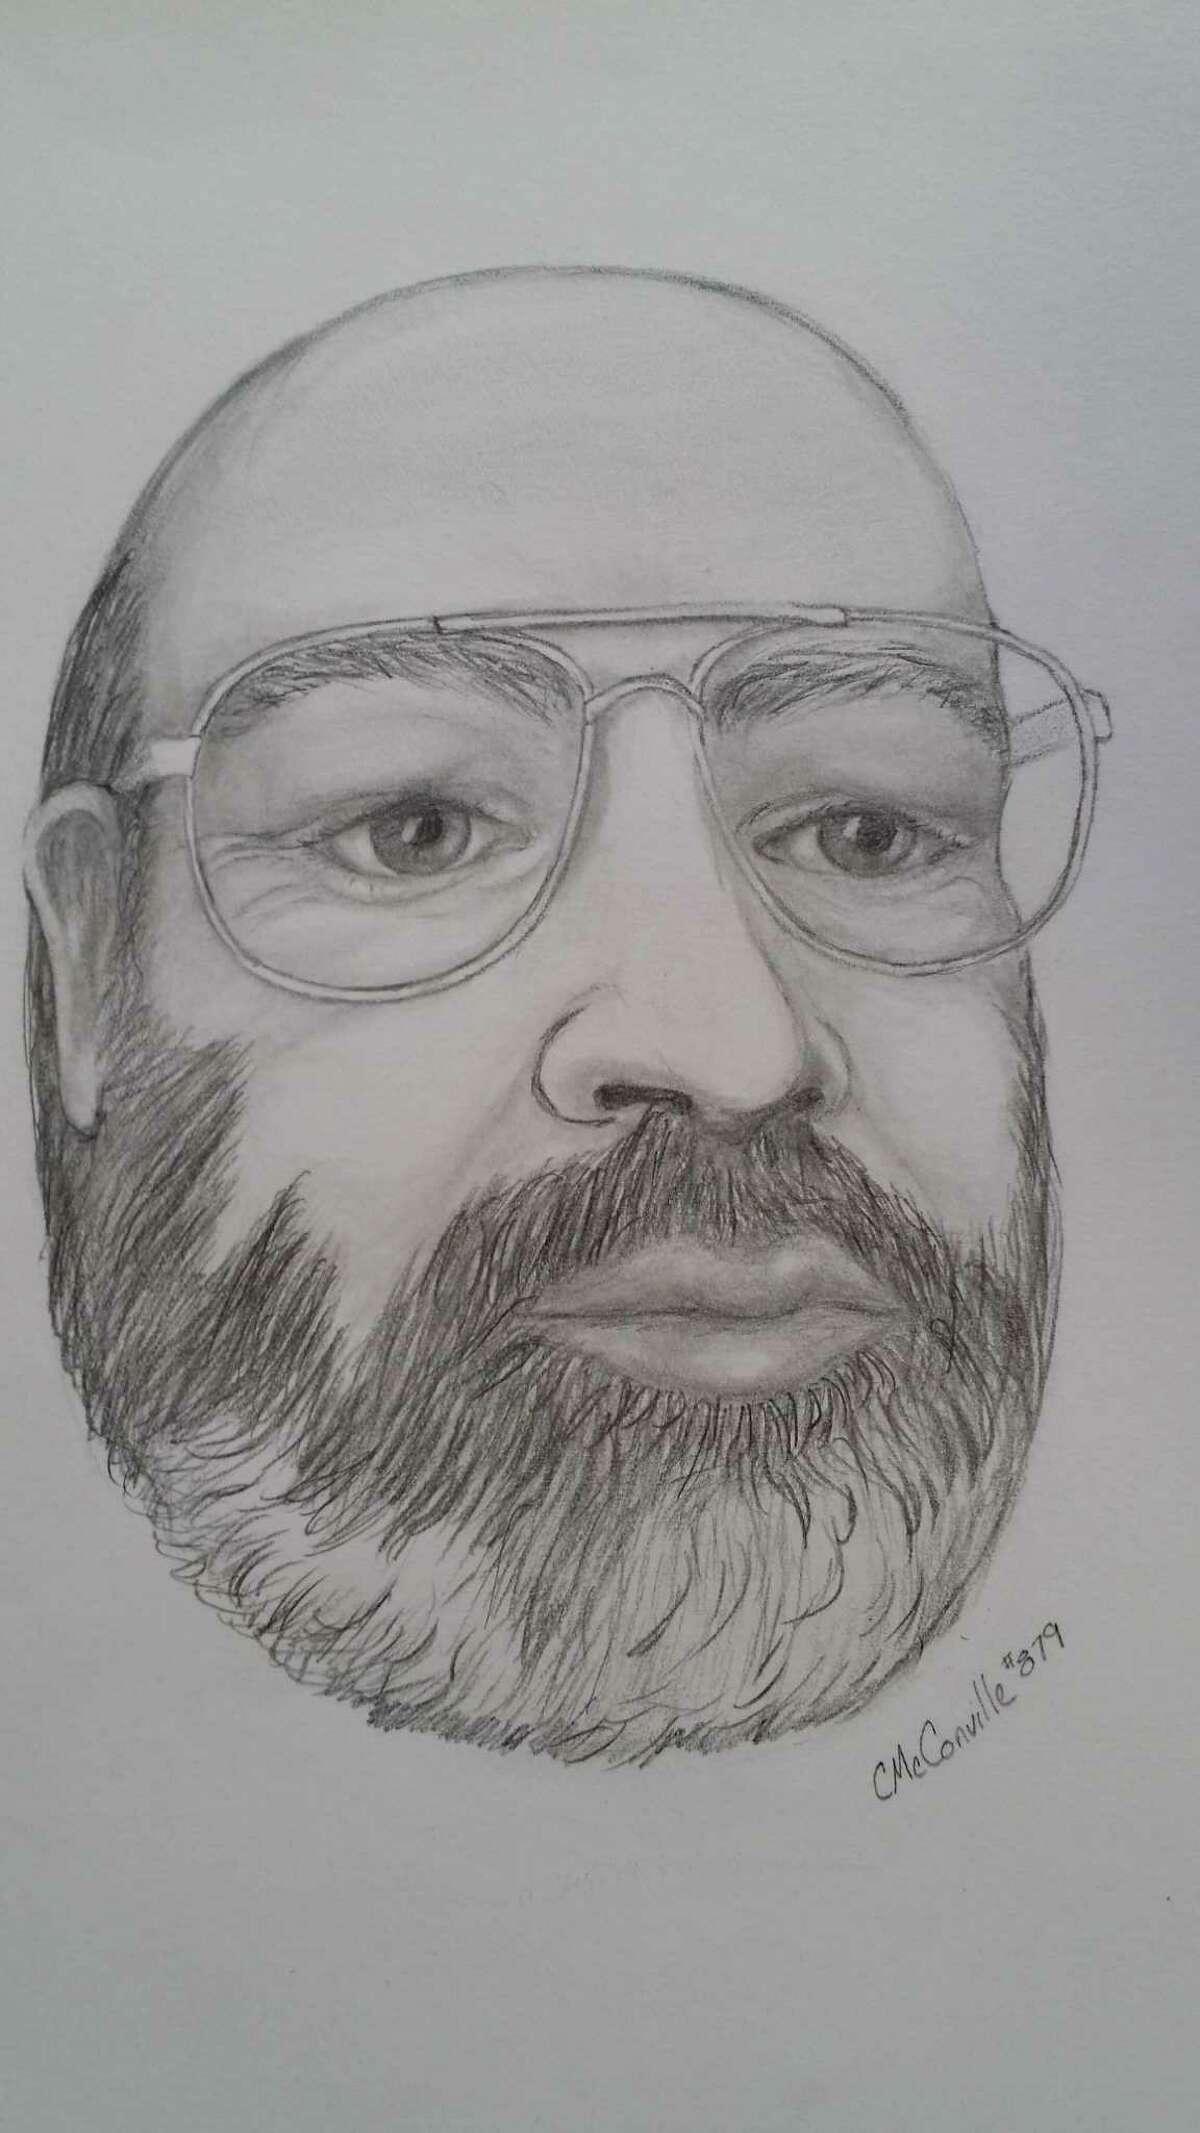 Sonoma County sheriff's investigators need help identifying this man